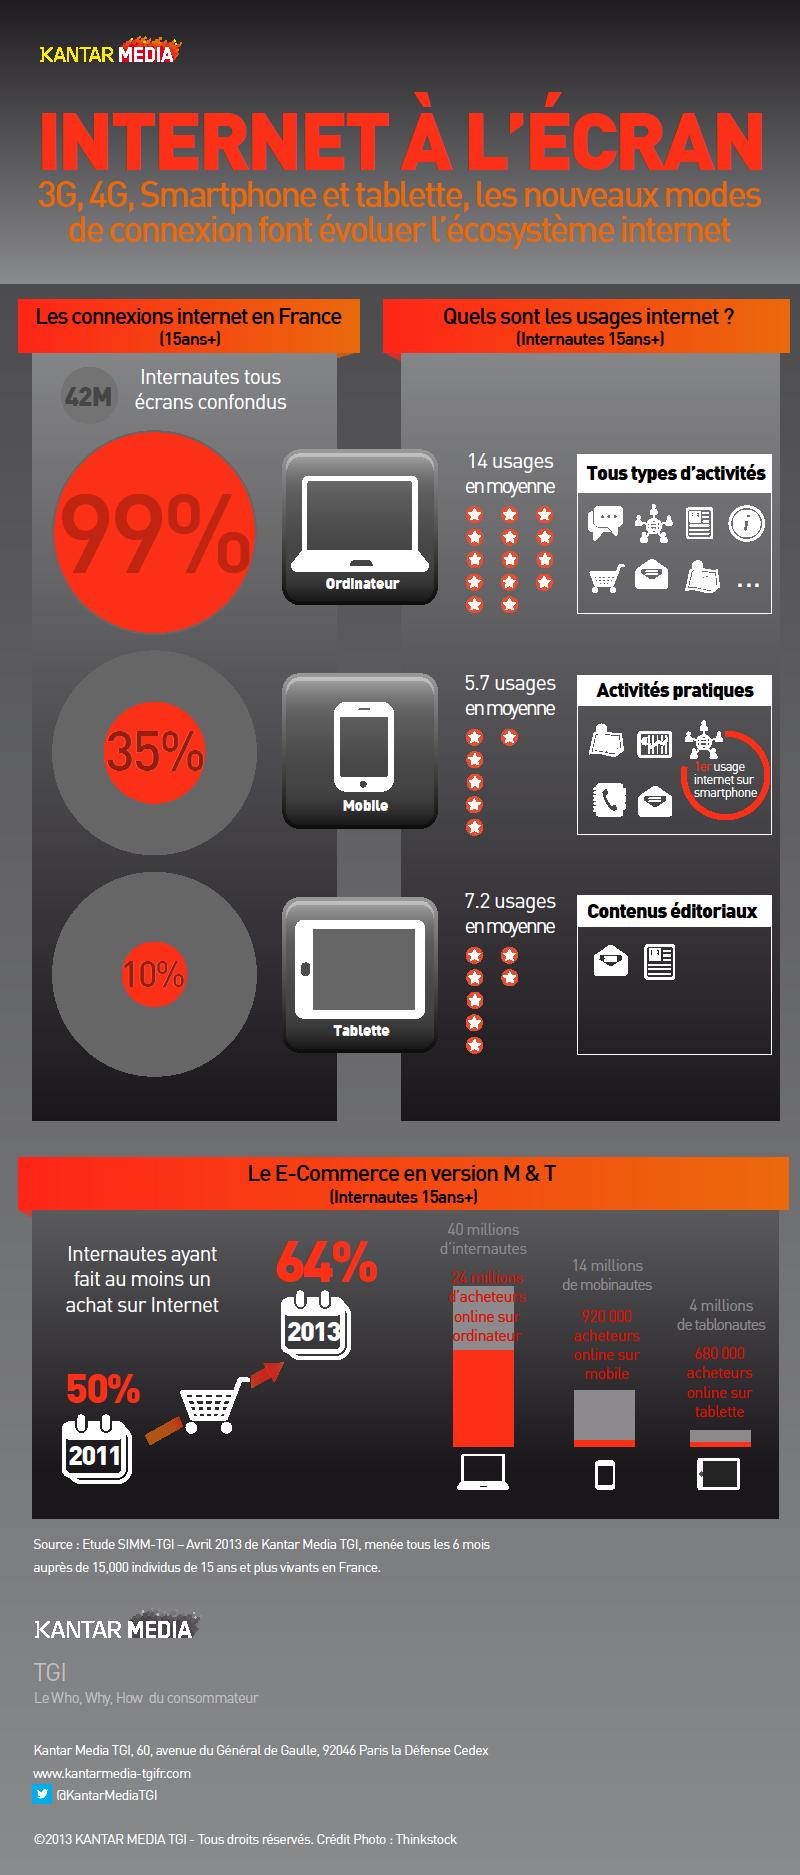 Etude Kantar Media TGI - 3 Ecrans Ordinateur - Mobile - Tablette